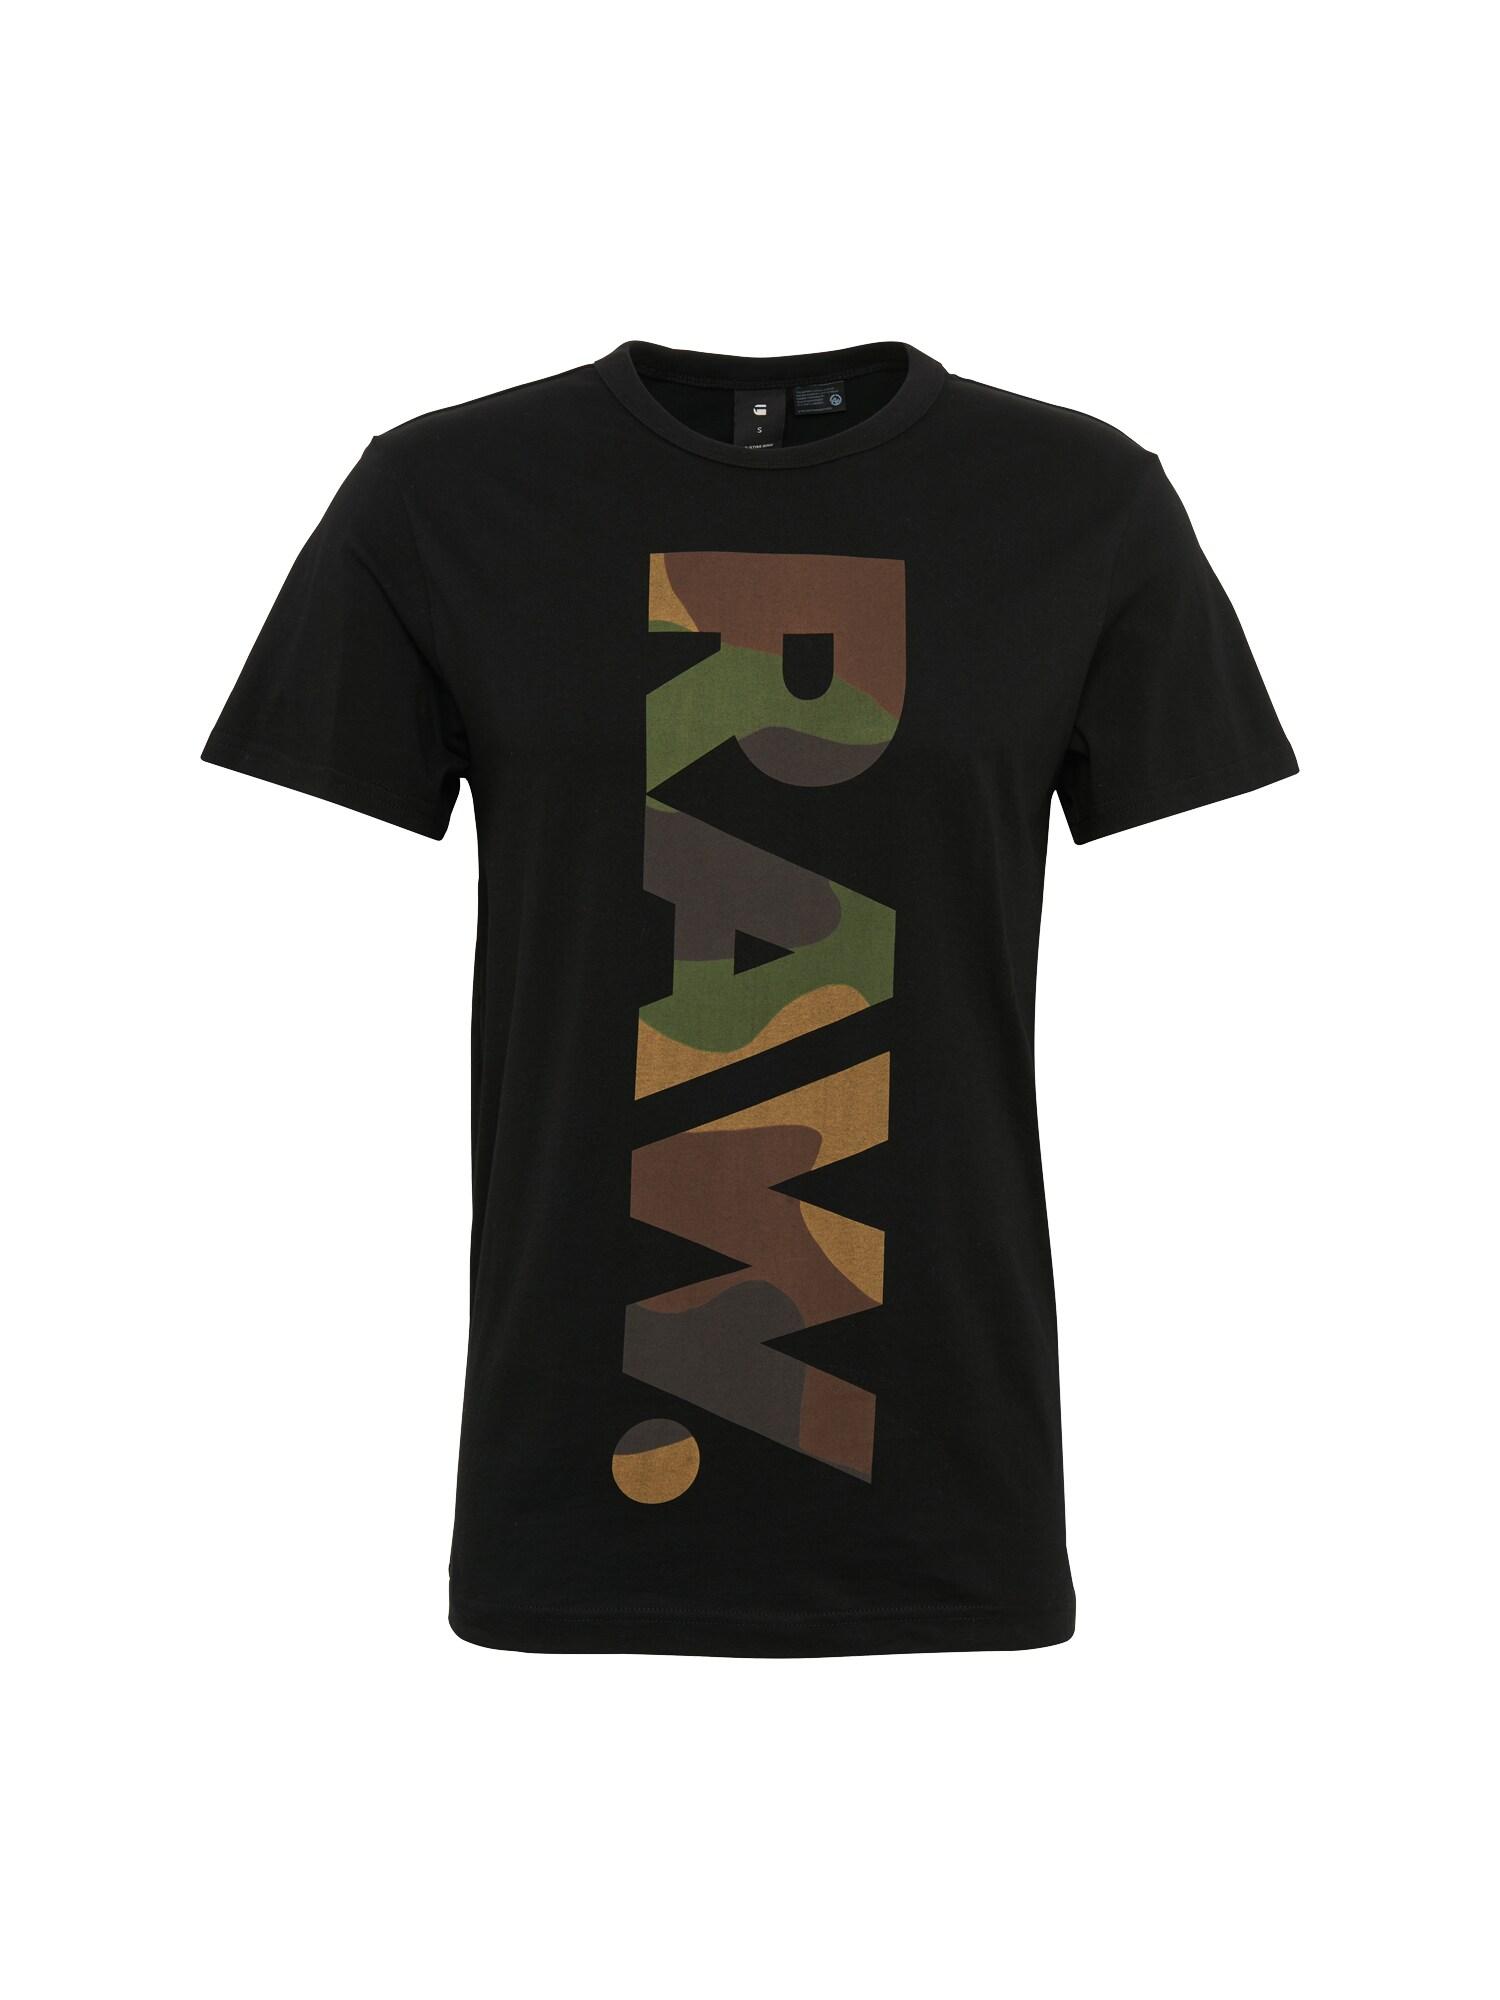 G-STAR RAW Heren Shirt Daba regular r t s s zwart